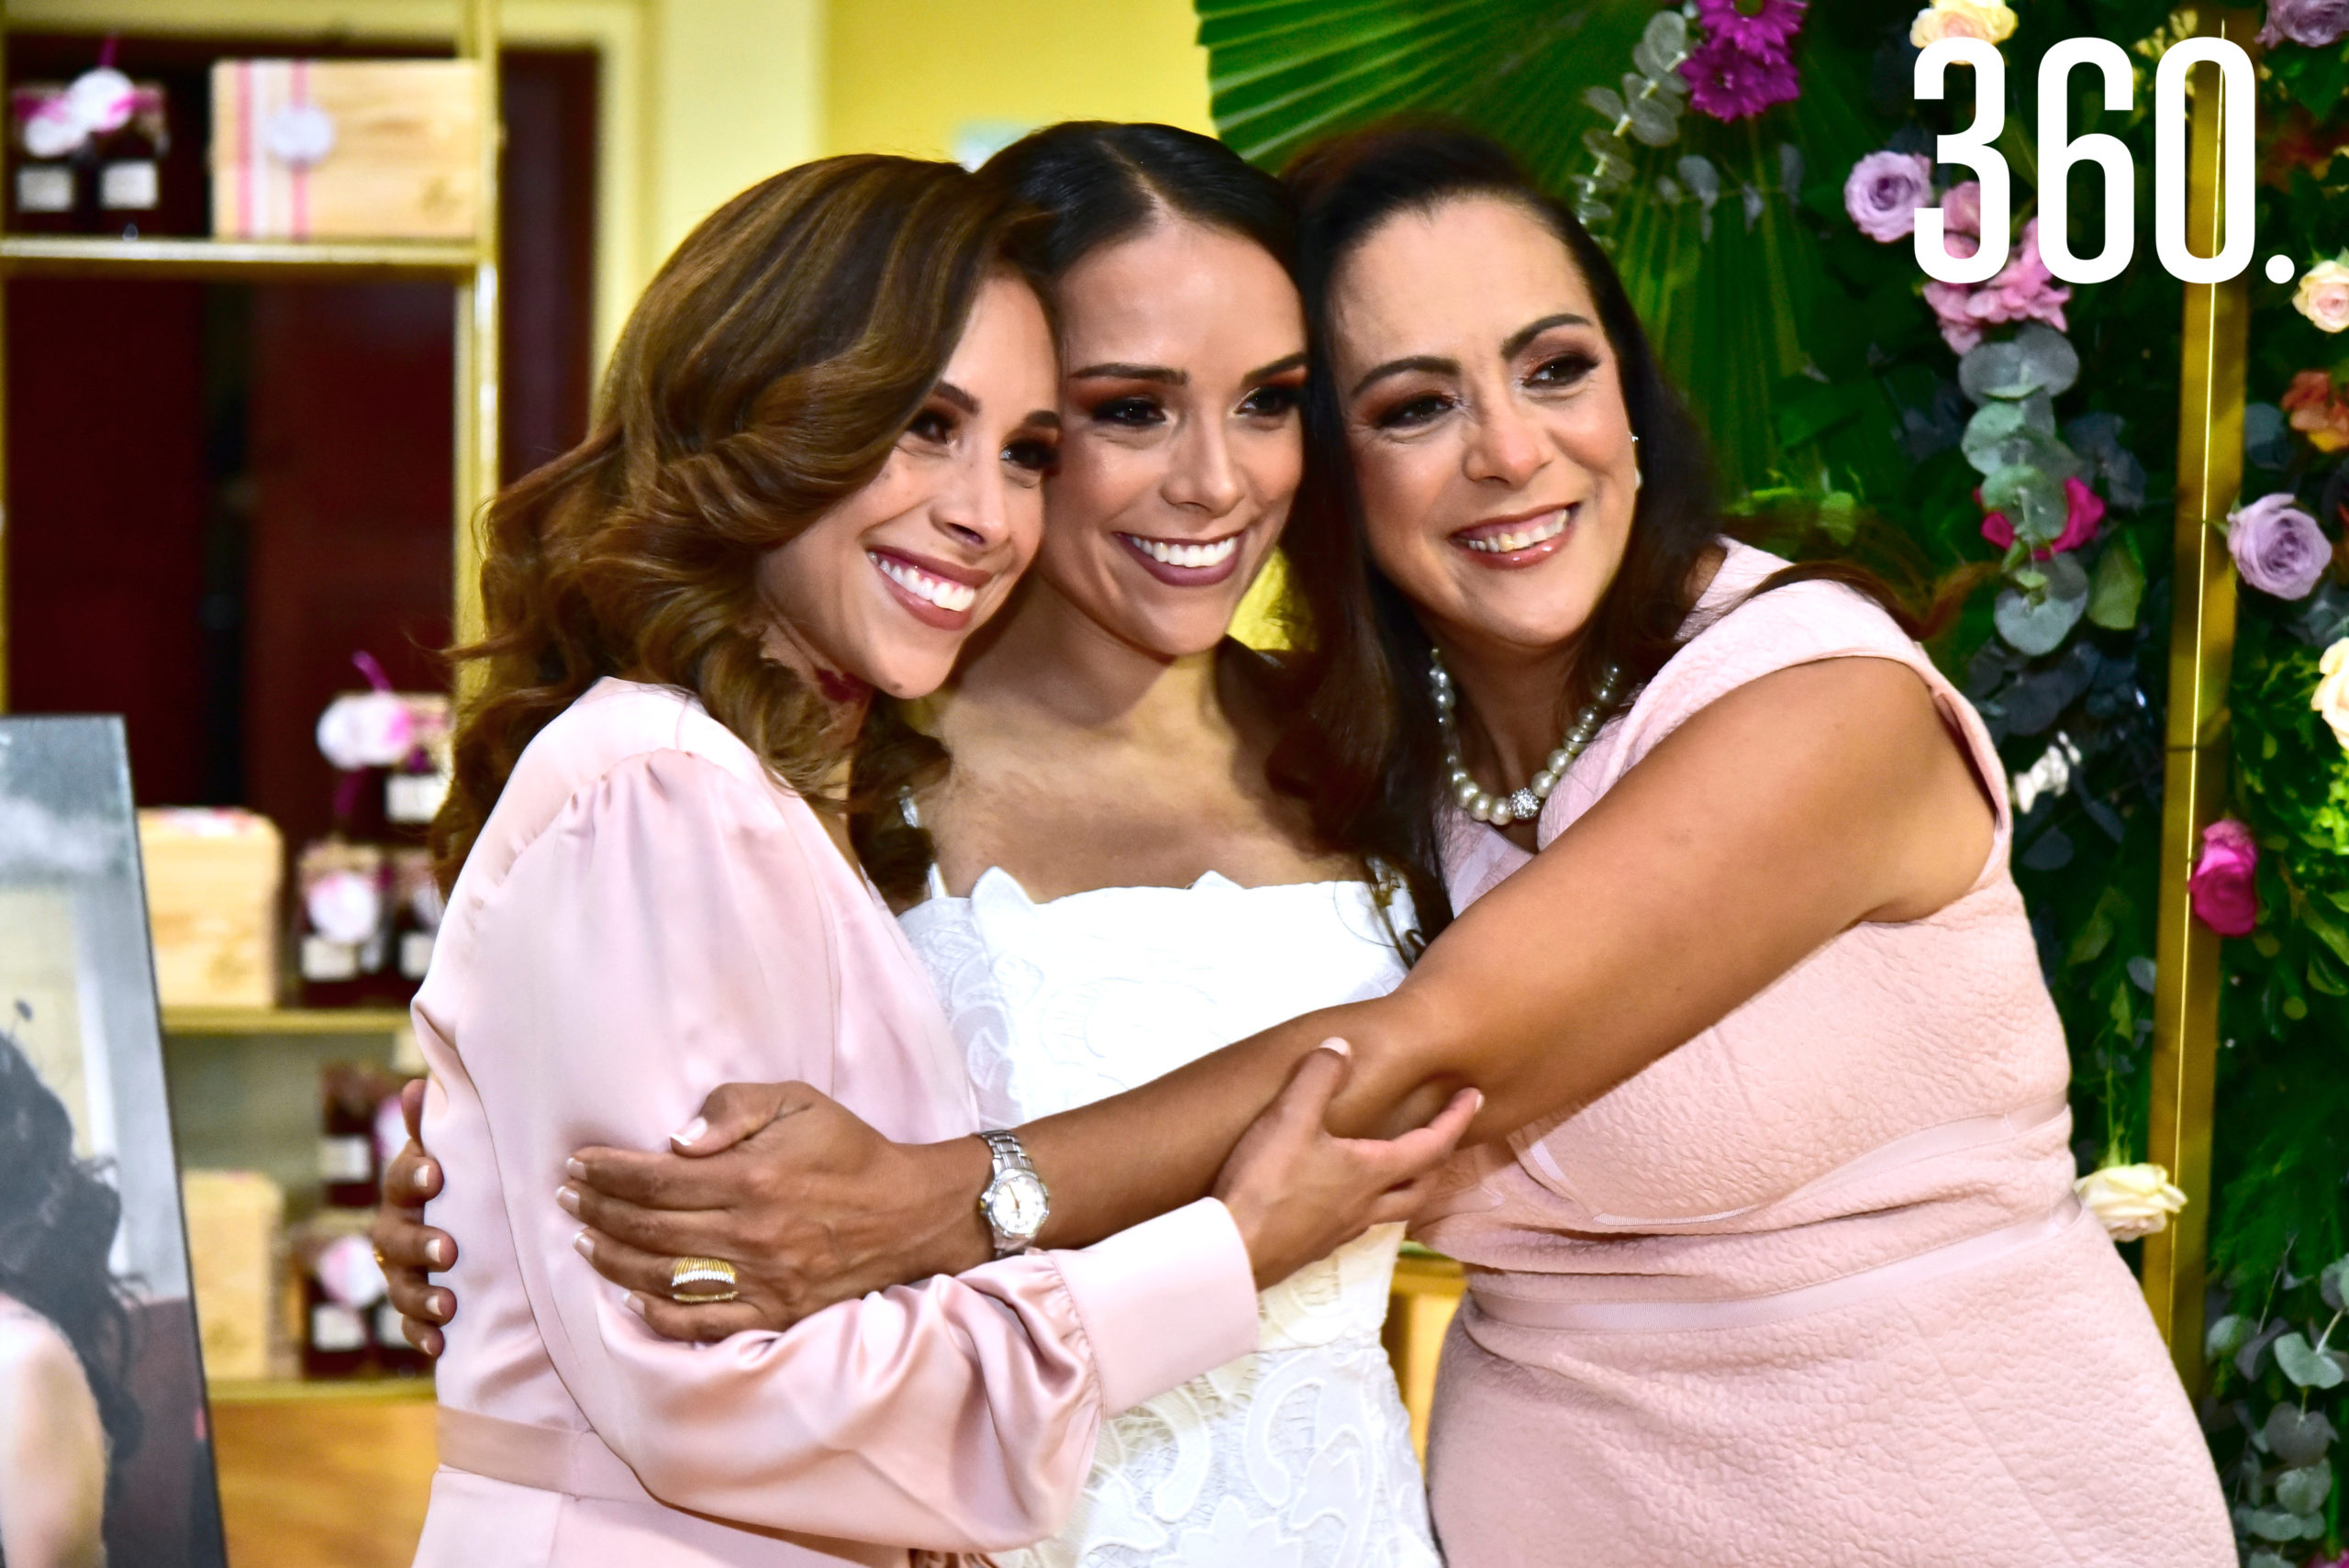 Marielena Molina, María Fernanda Molina y Luz Elena Berrueto.